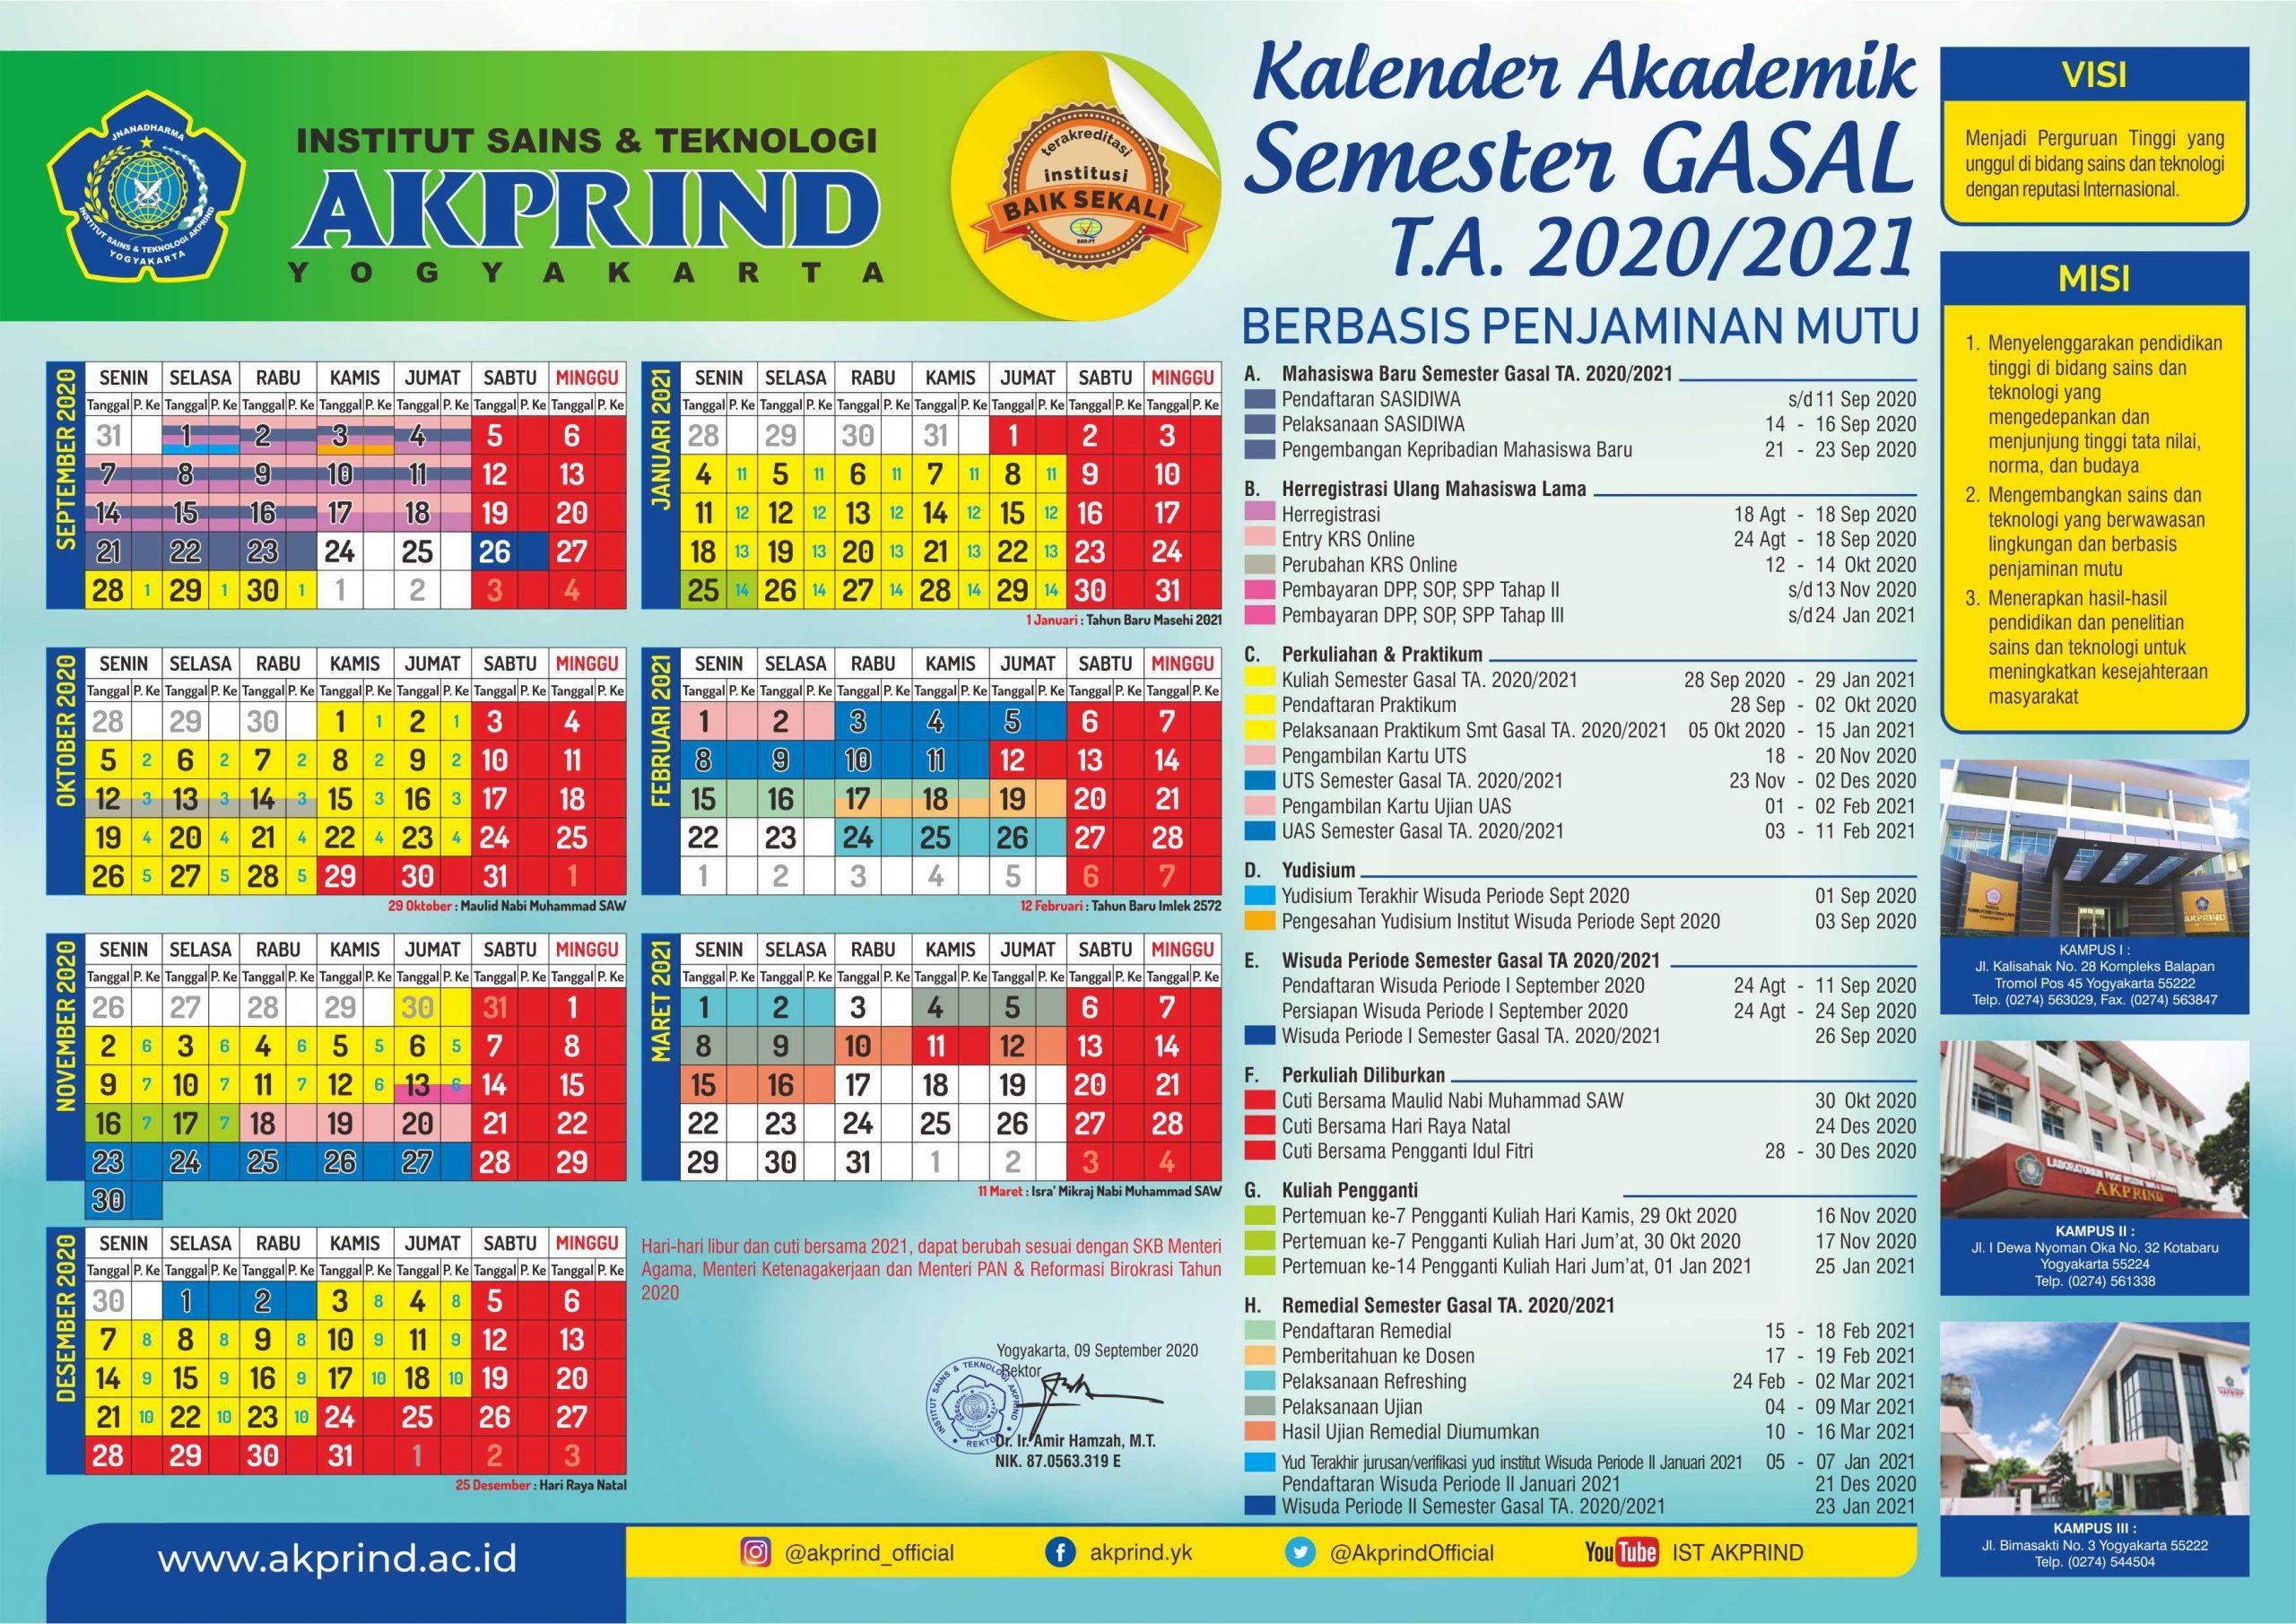 Kalender Akademik Semester Gasal Tahun 2020/2021